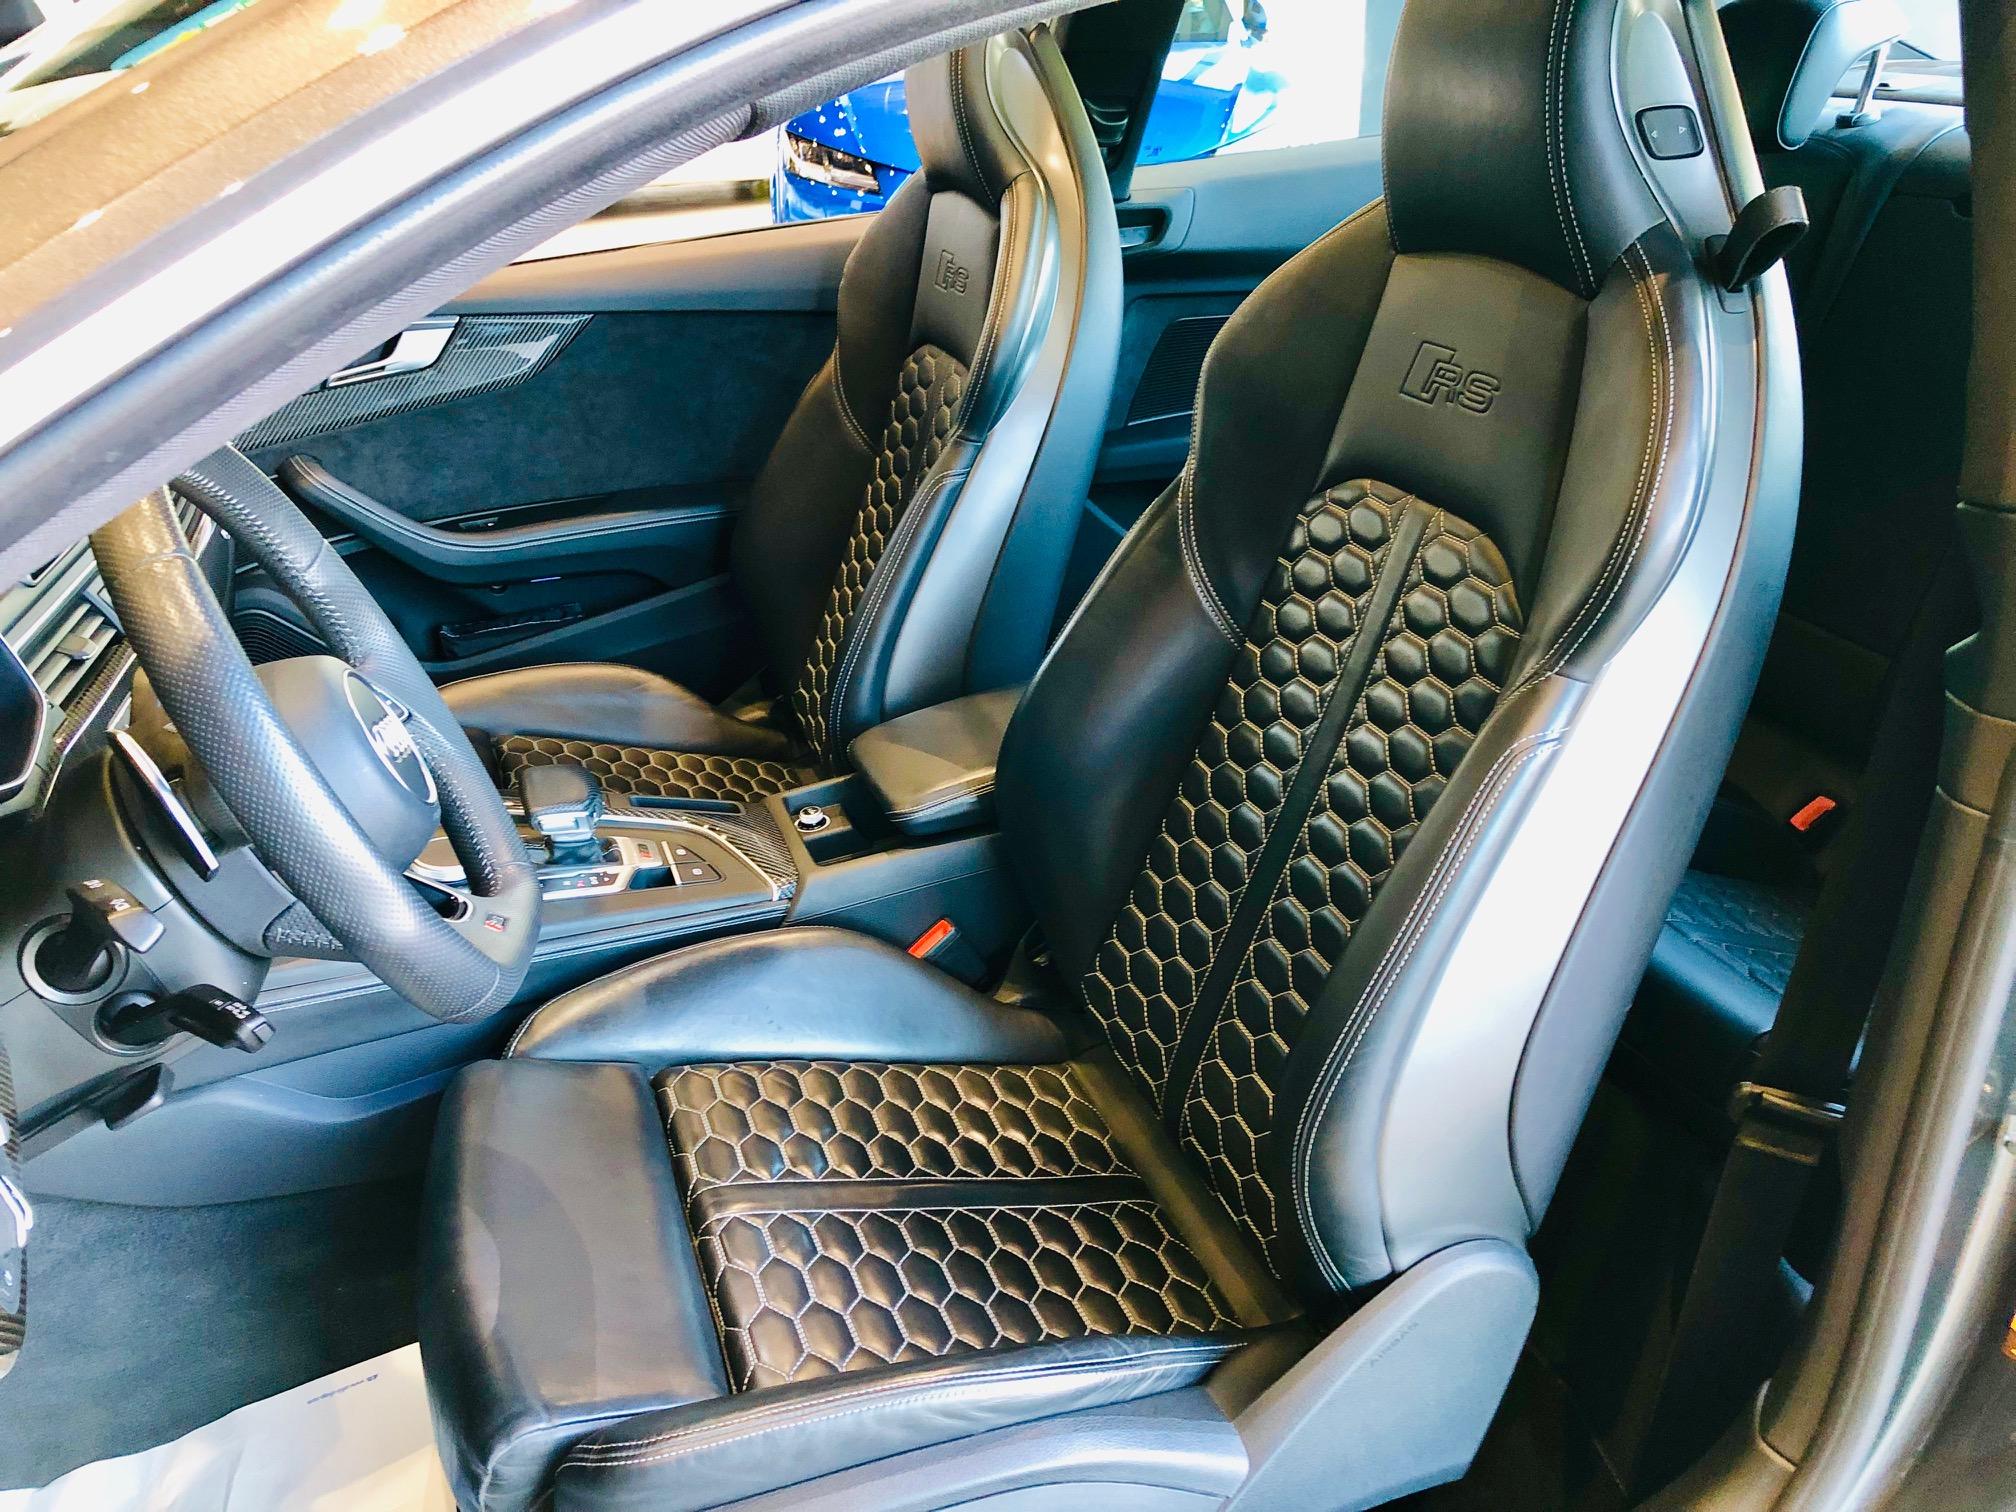 Occasion Audi RS5 2.9 v6 Biturbo 450cv Face Avant Gauche